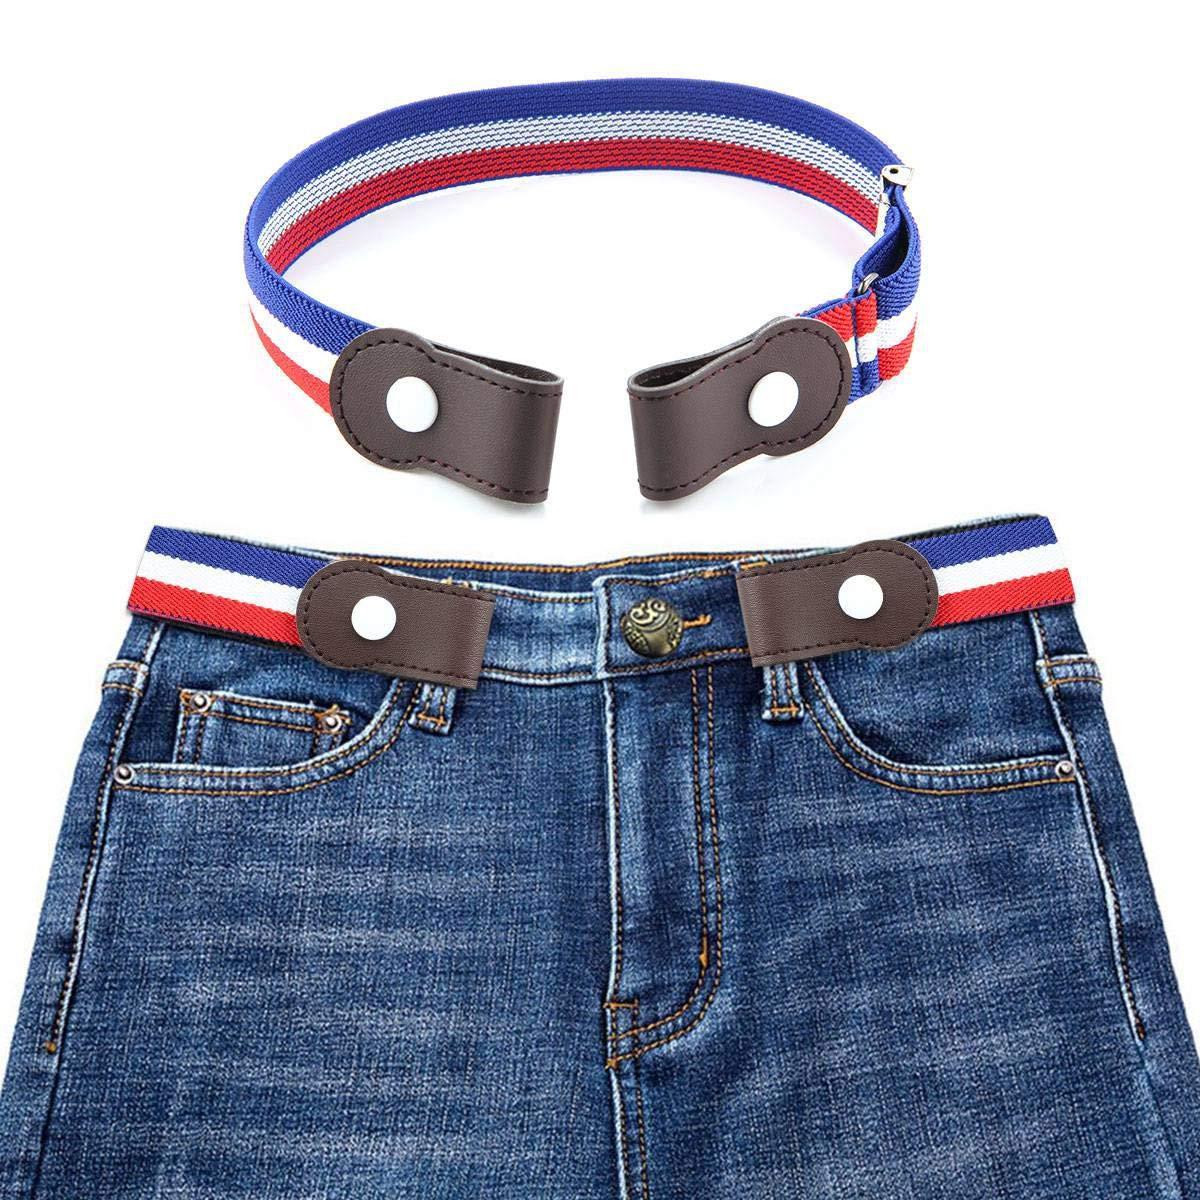 No Bulge KOBWA Buckle-Free Elastic Belt for Women Men Children Hassle Kids Ladies No Buckle Elastic Belt for Jeans Pants Dresses Invisible Belt